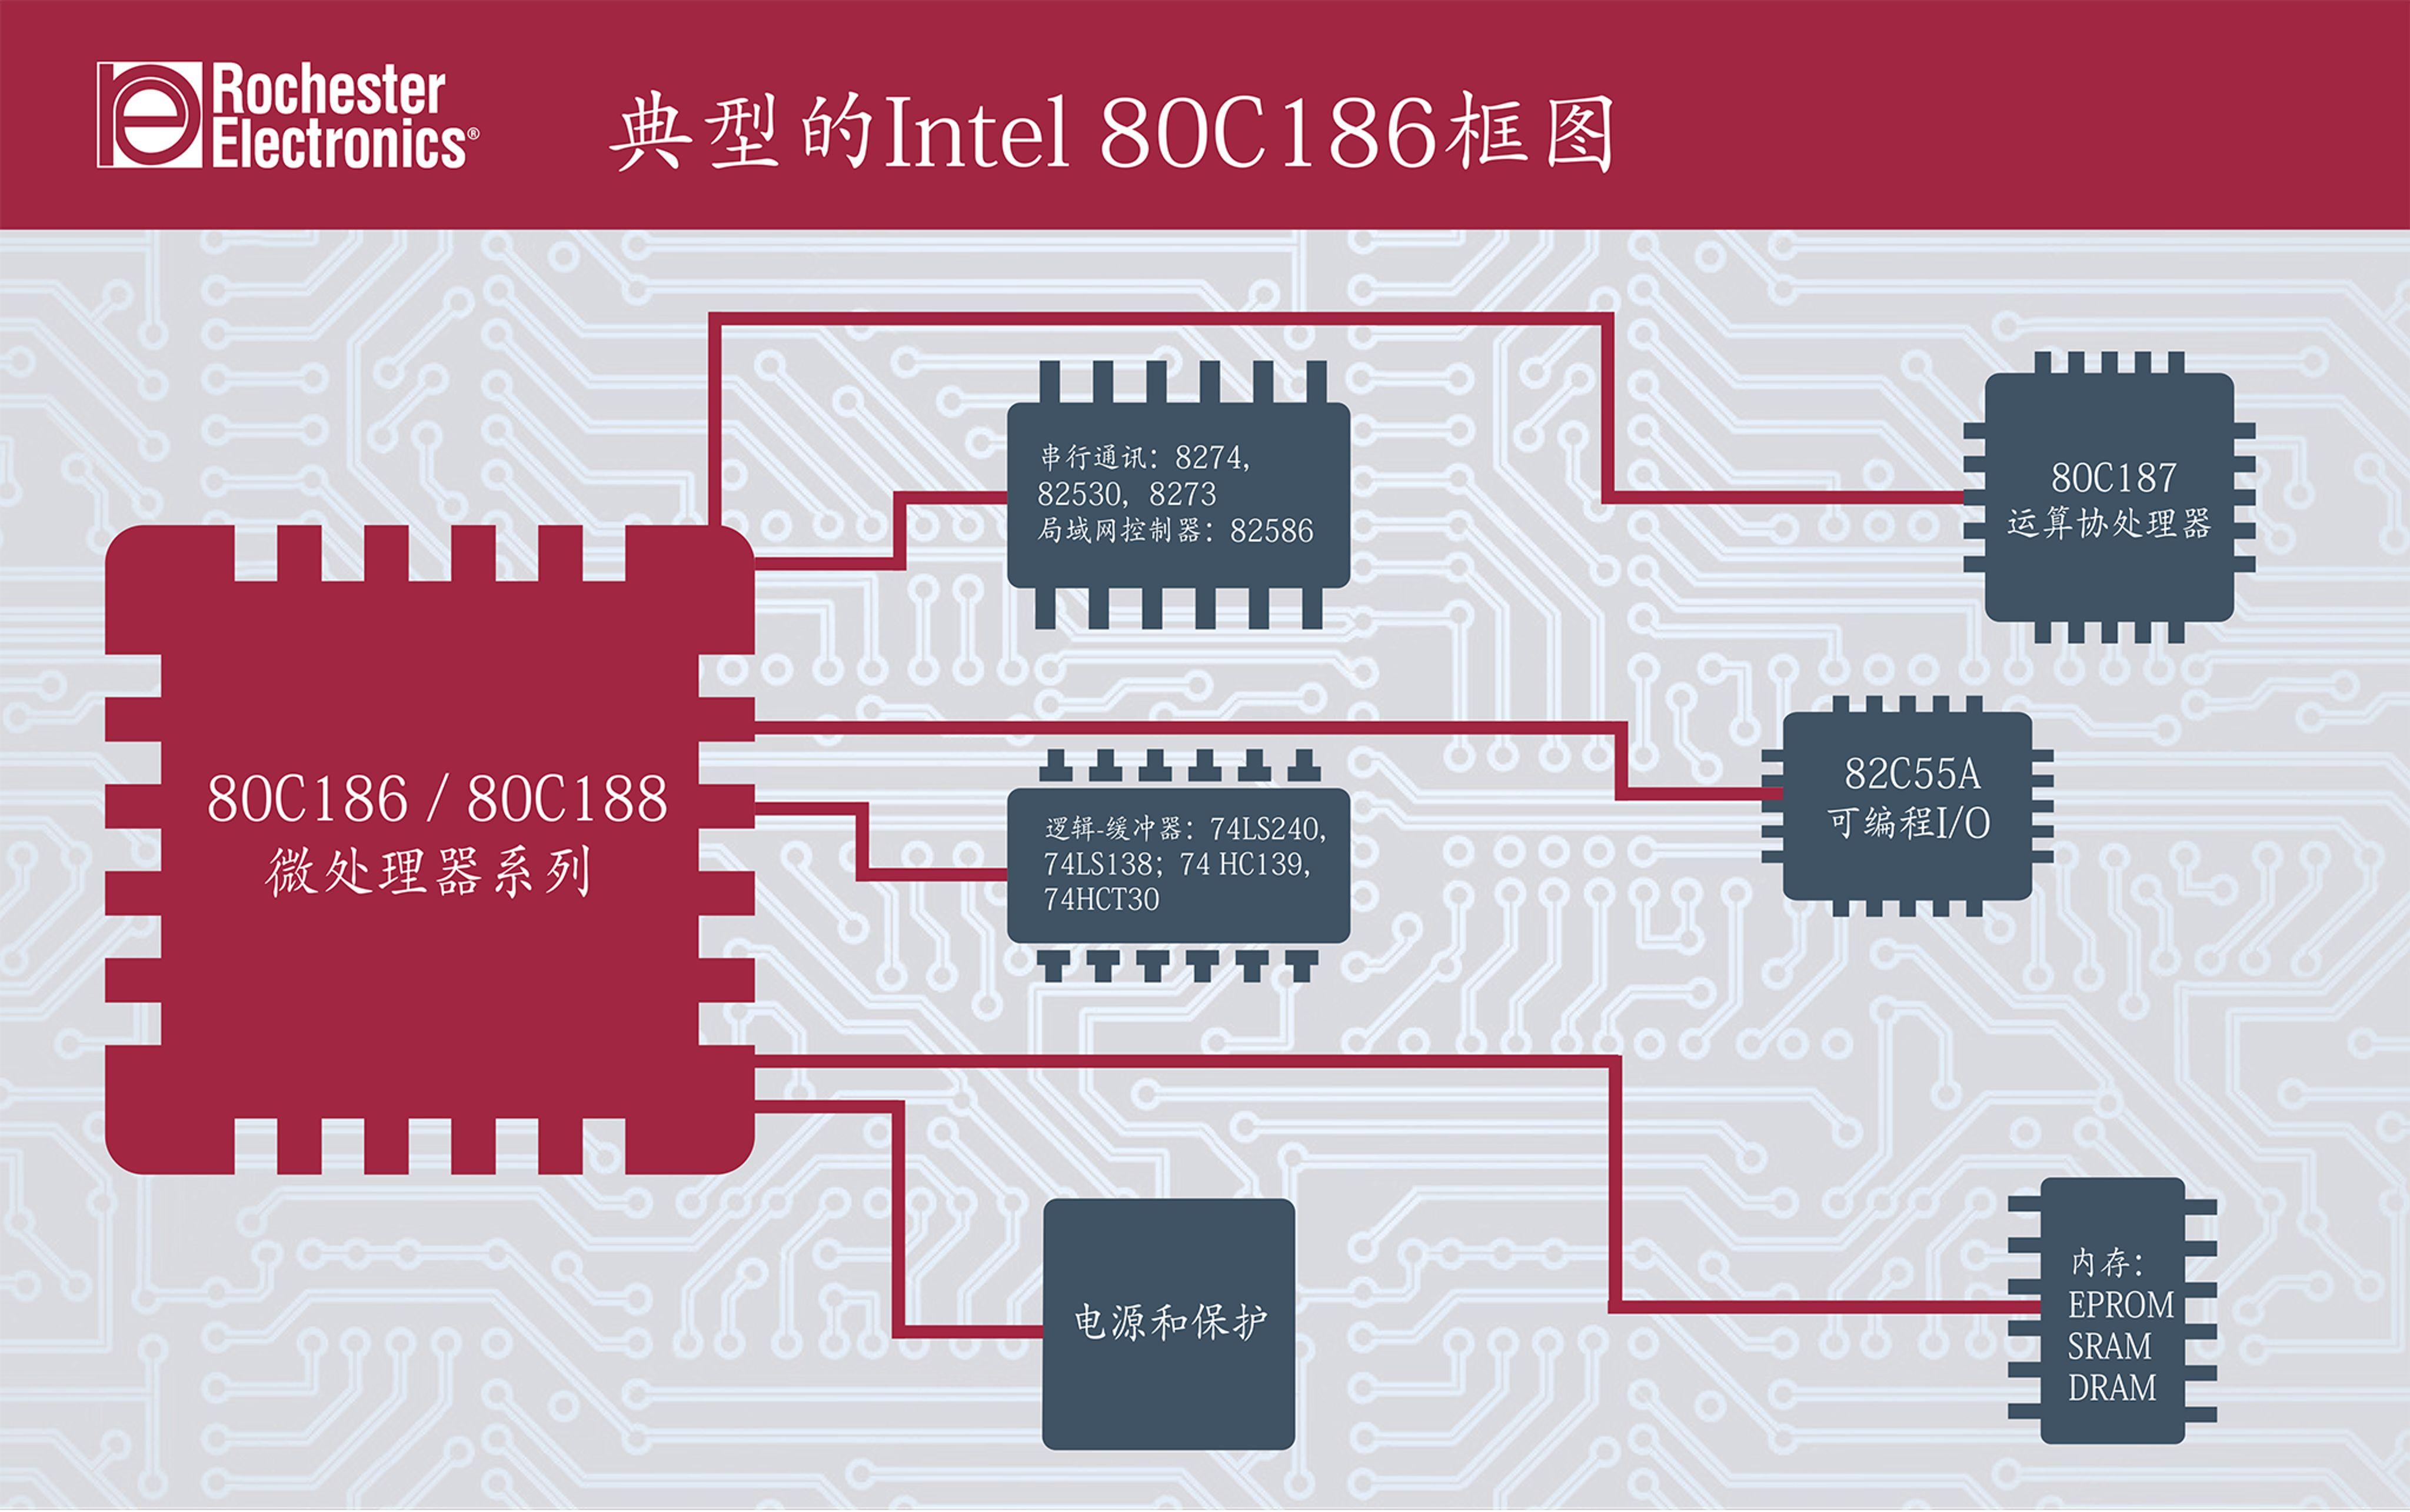 Intel_80C186_microprocessor_diagram_CN